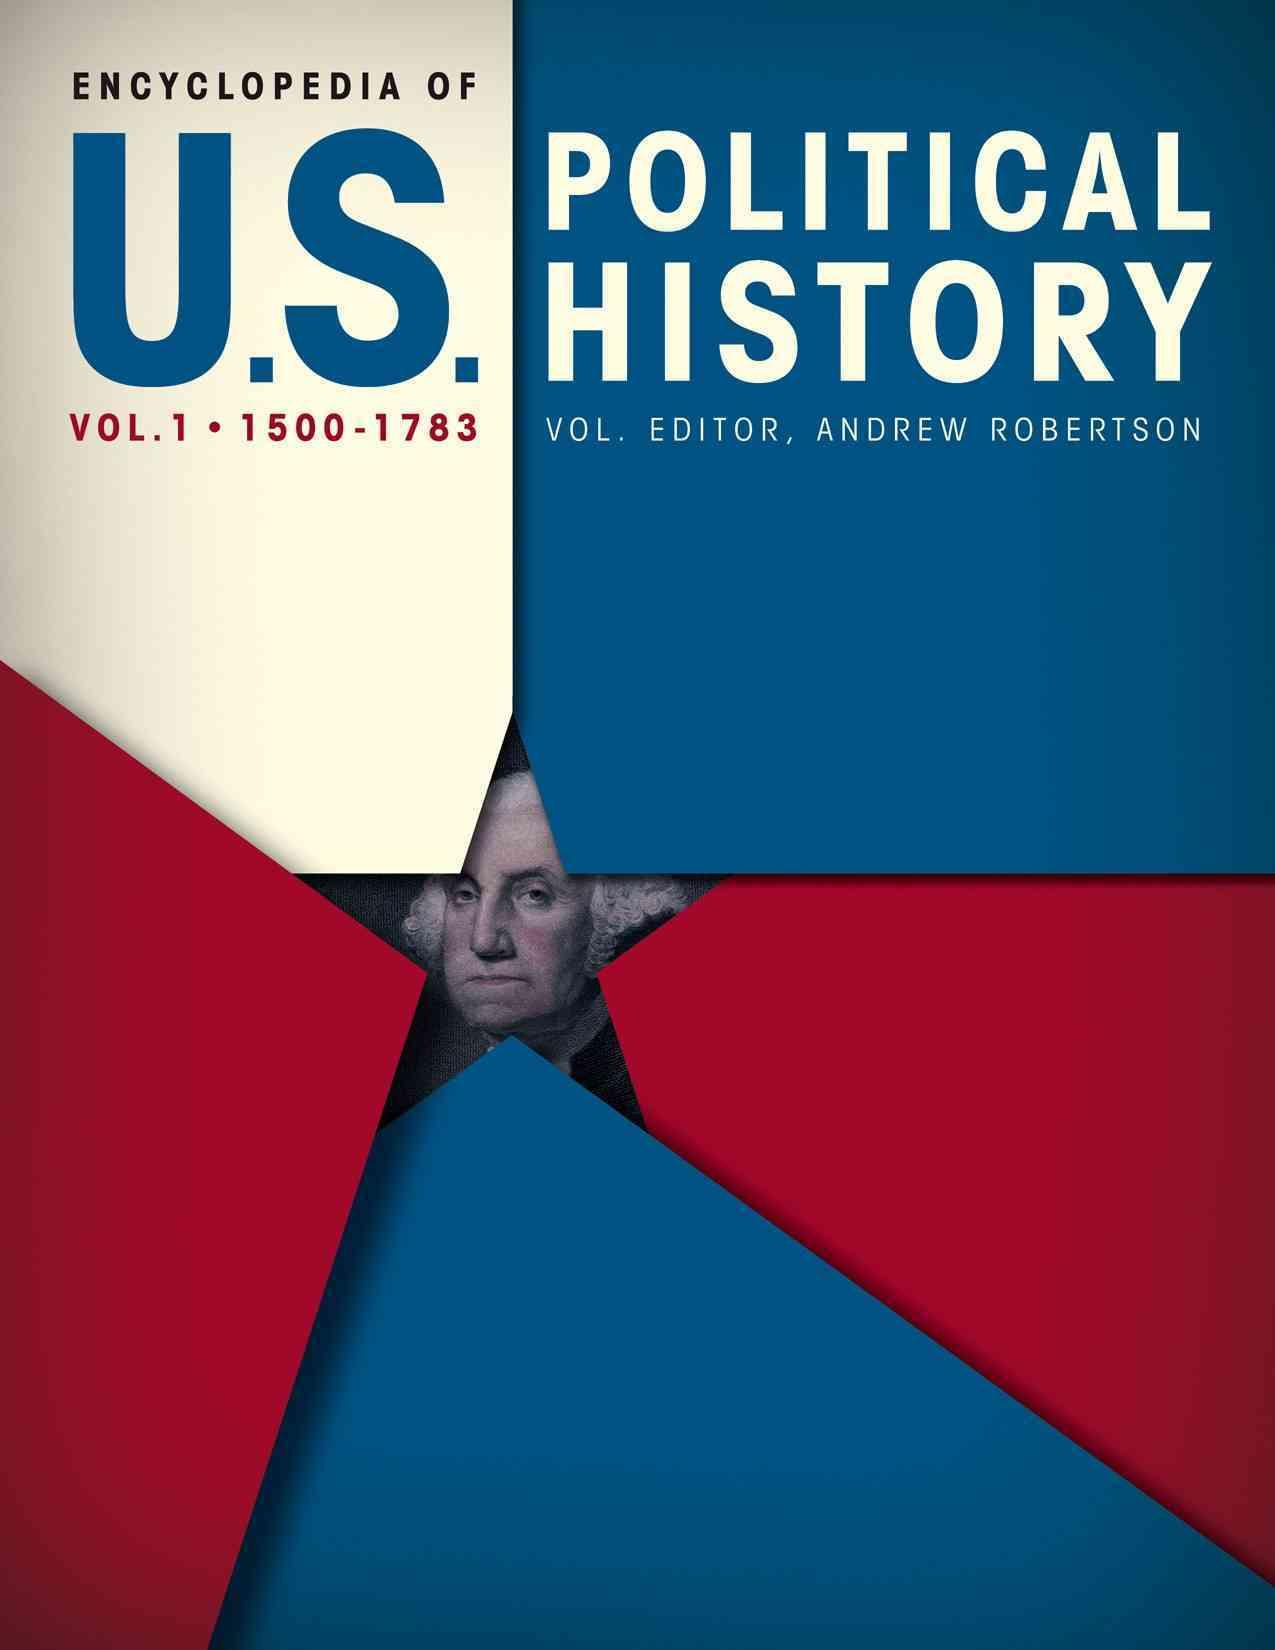 Encyclopedia of U.S. Political History (Hardcover)